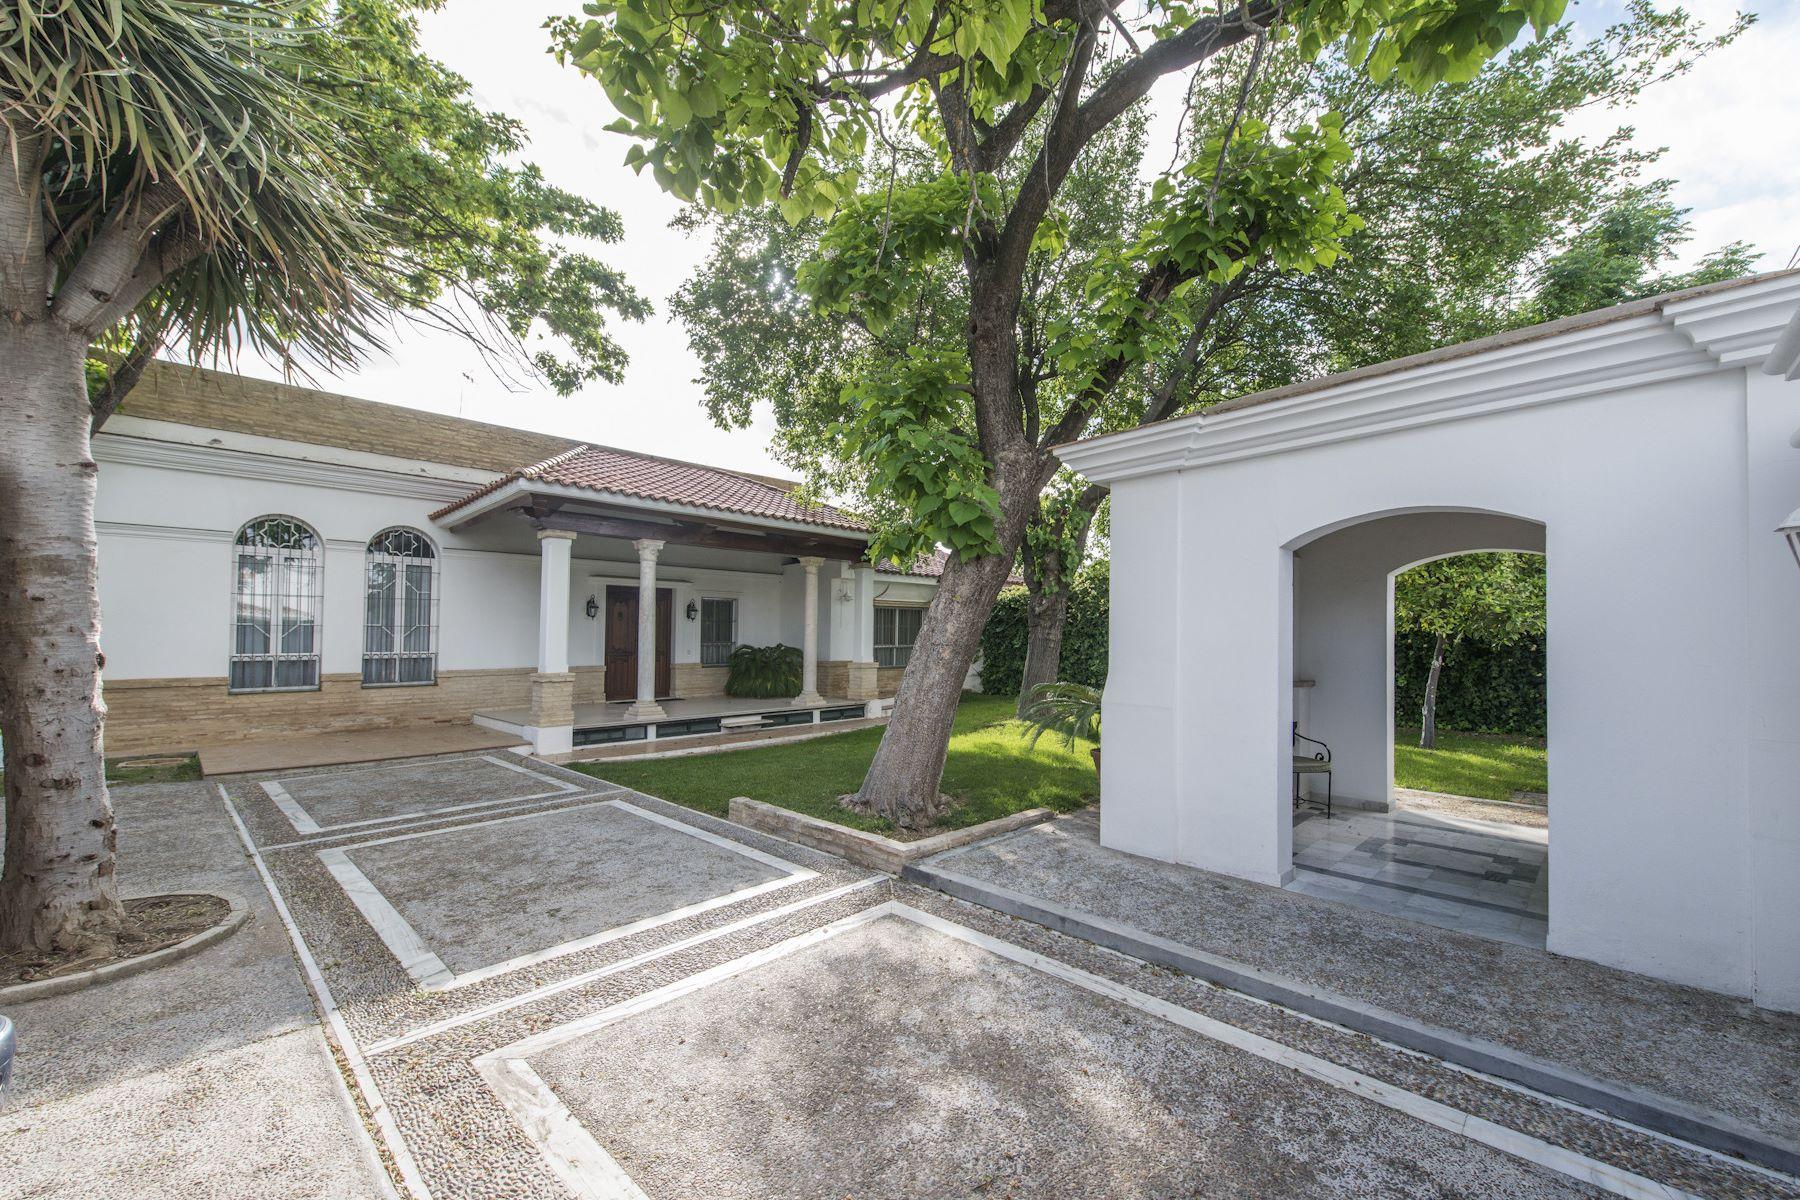 Maison unifamiliale pour l Vente à Villa located in Santa Clara Urbanization Autres Andalucia, Andalousie, Espagne